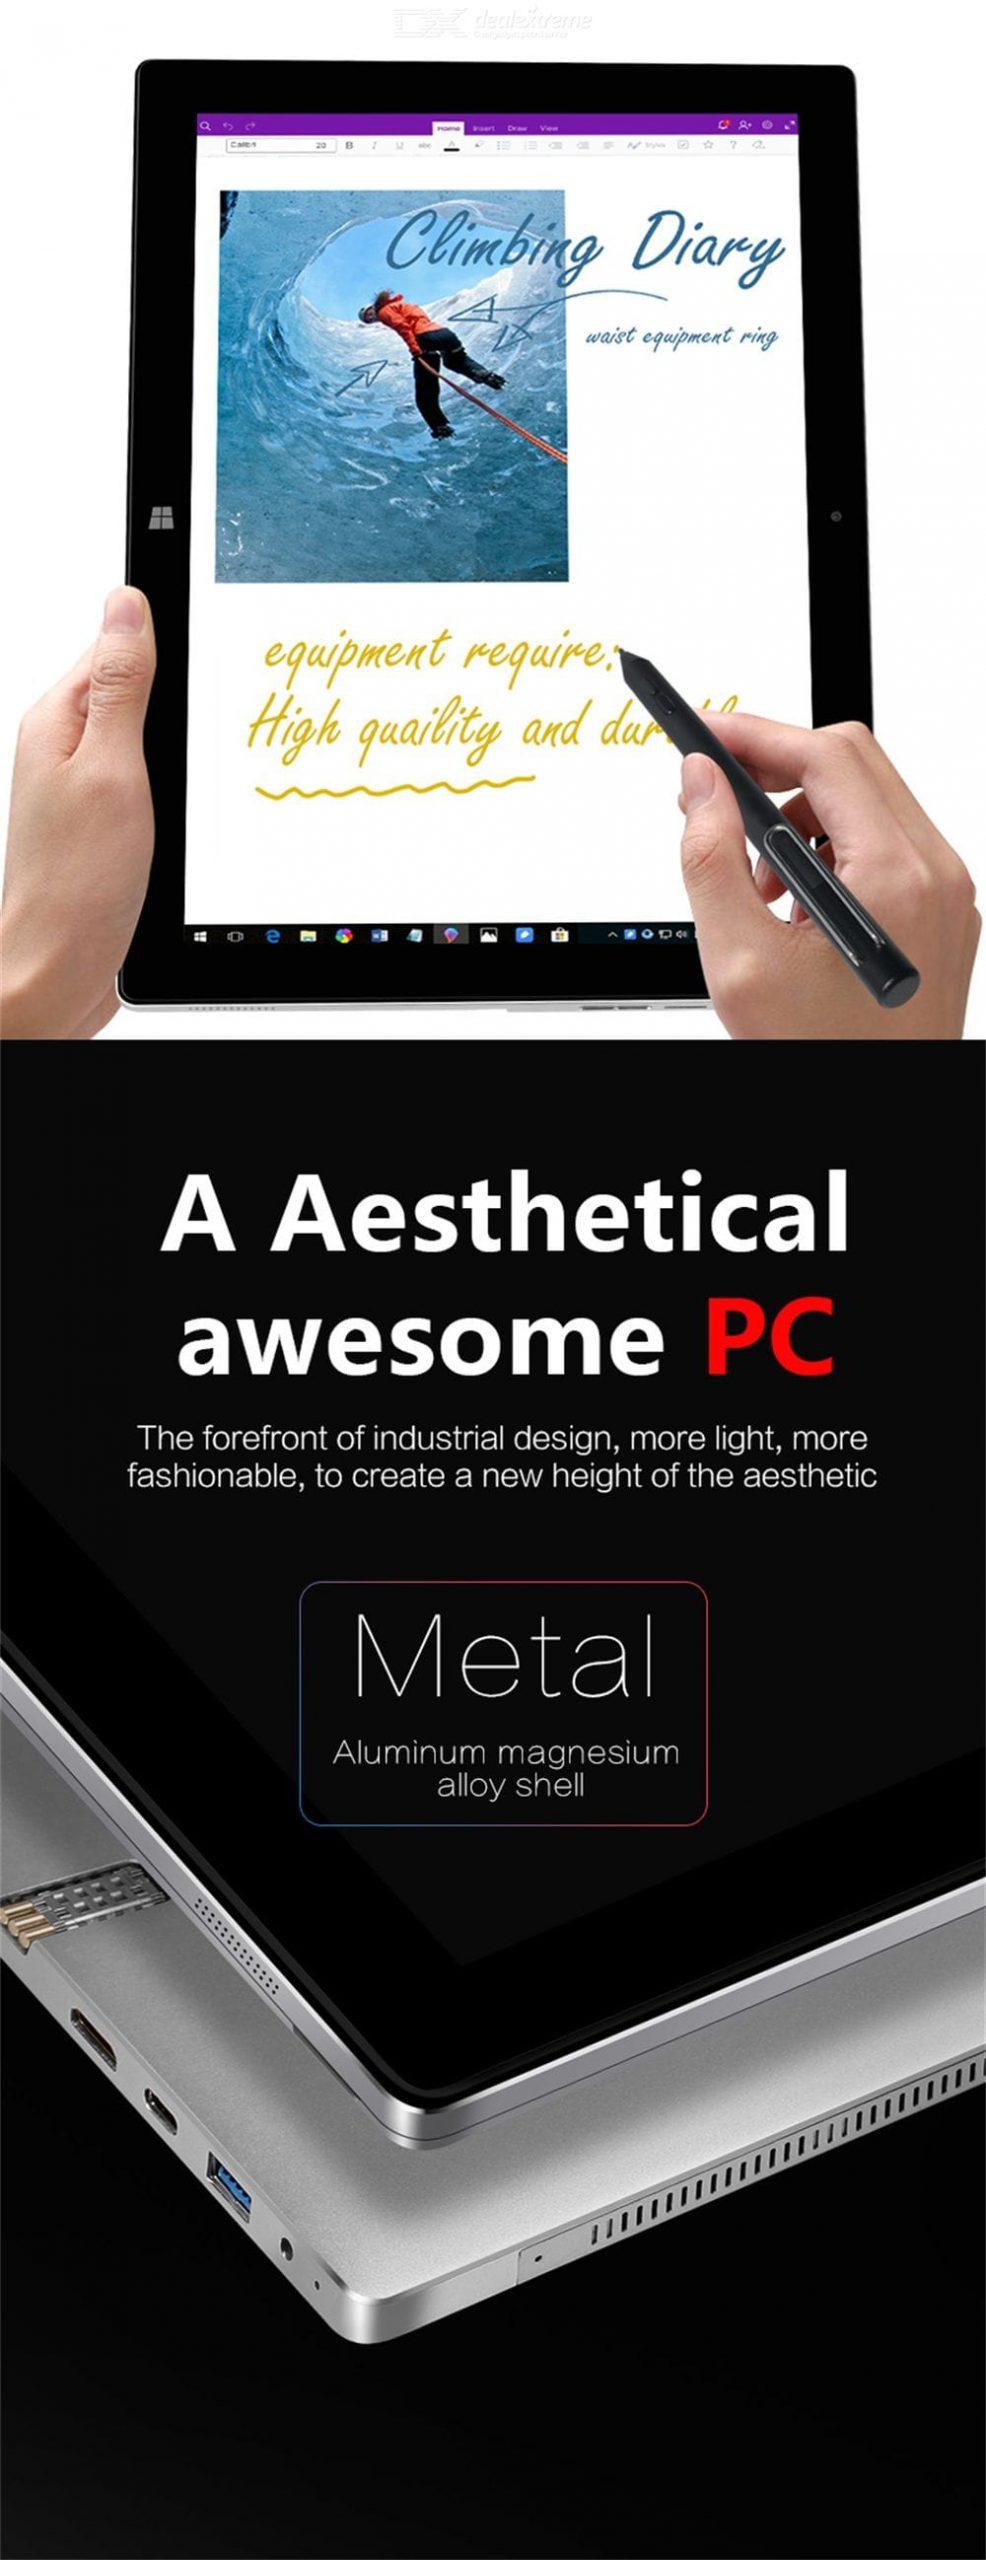 VOYO VBook I7 Plus Tablet